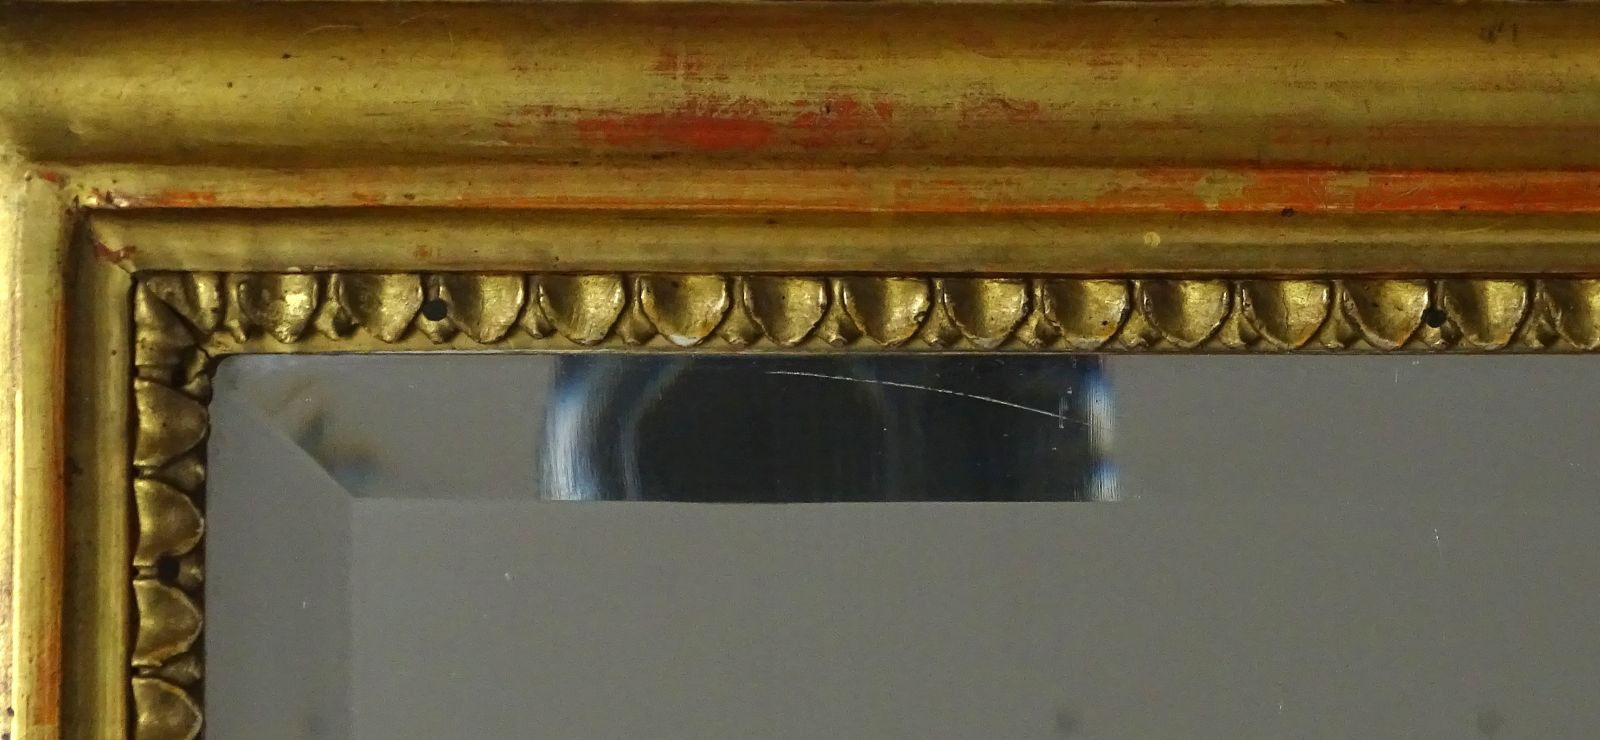 DSC03559.JPG (1600×740)